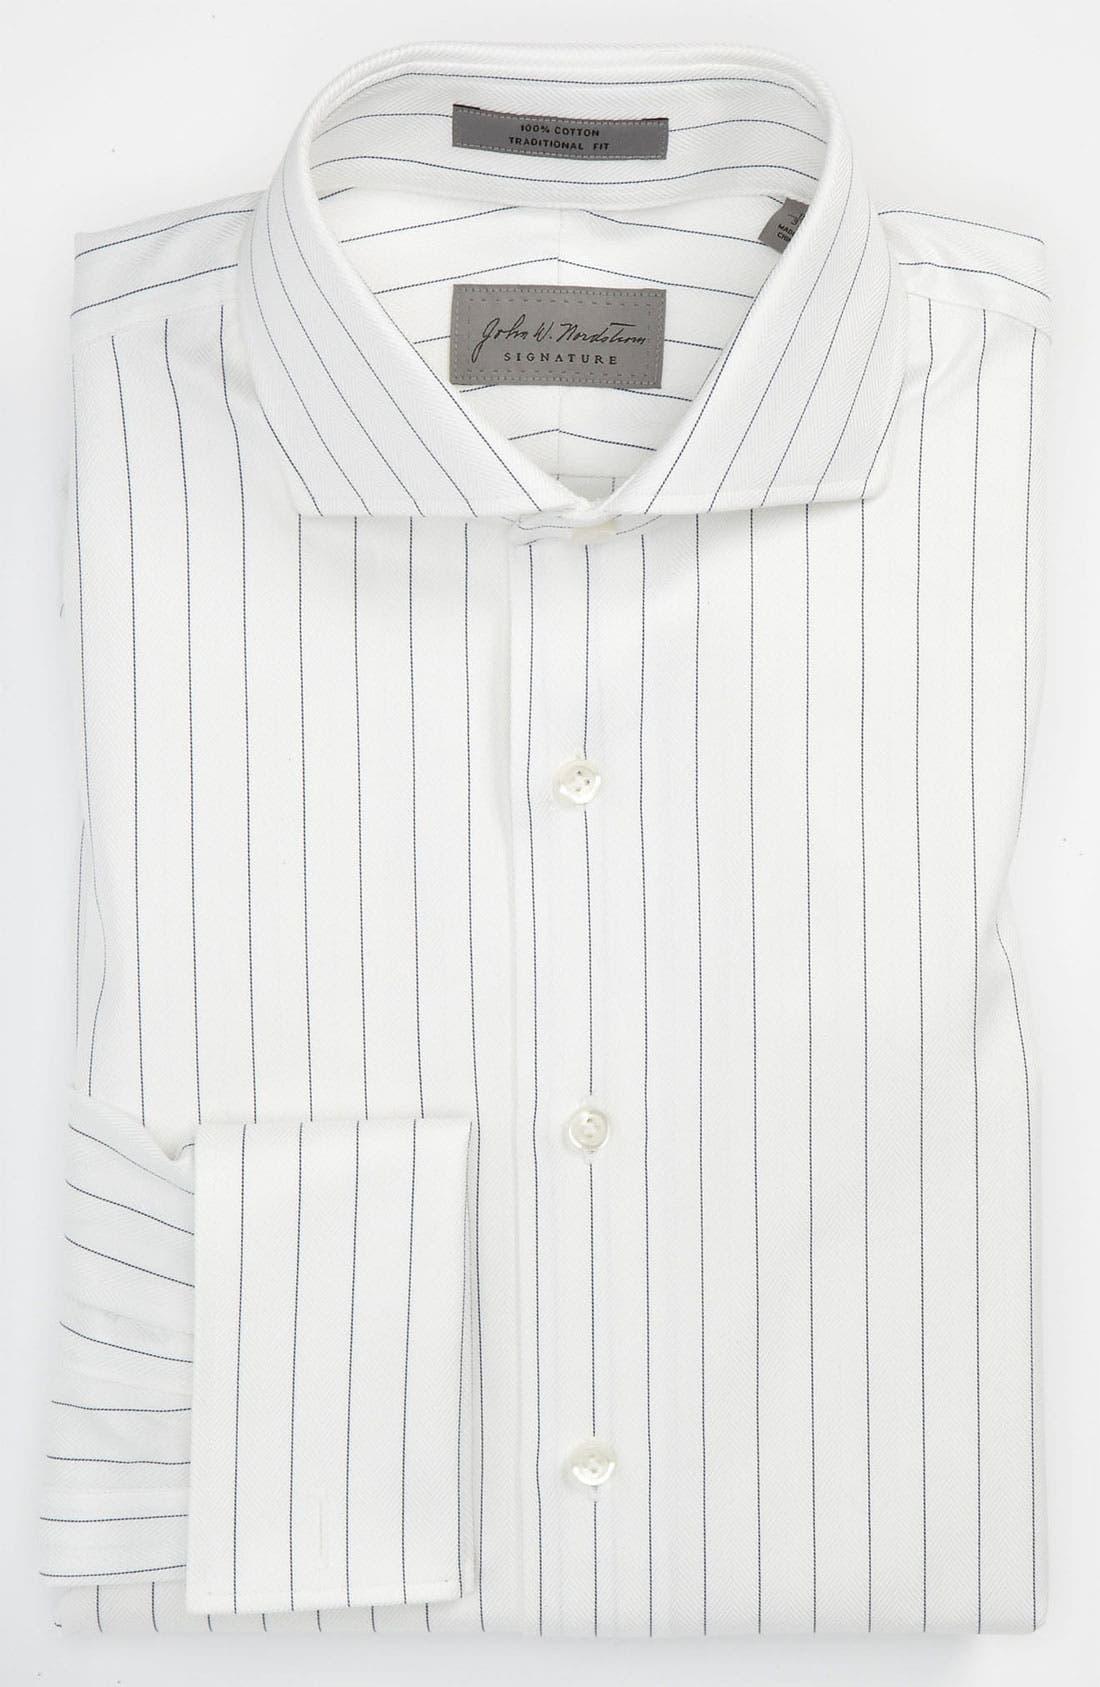 Main Image - John W. Nordstrom® Signature Traditional Fit Dress Shirt